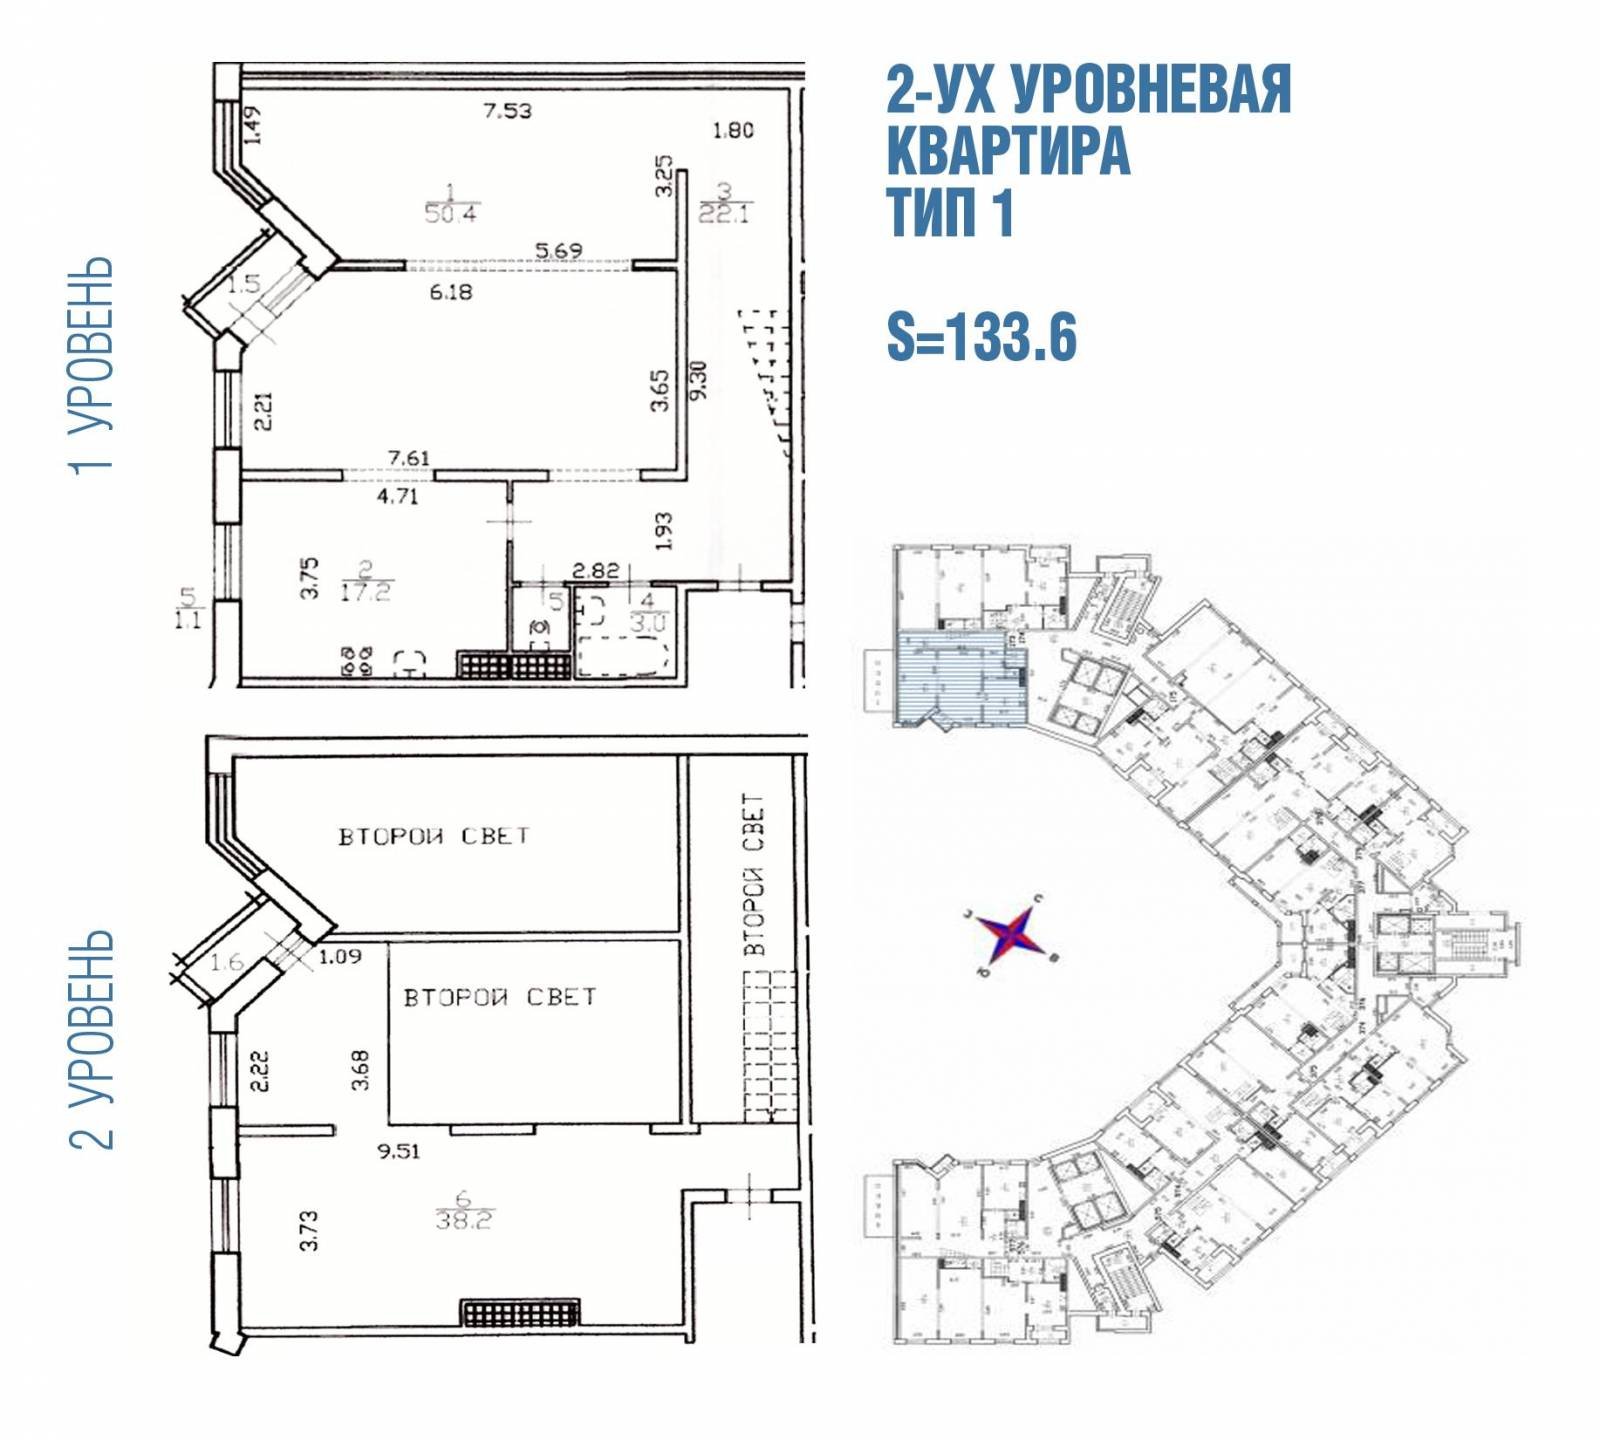 Двухуровневая квартира тип 1 S=133,6